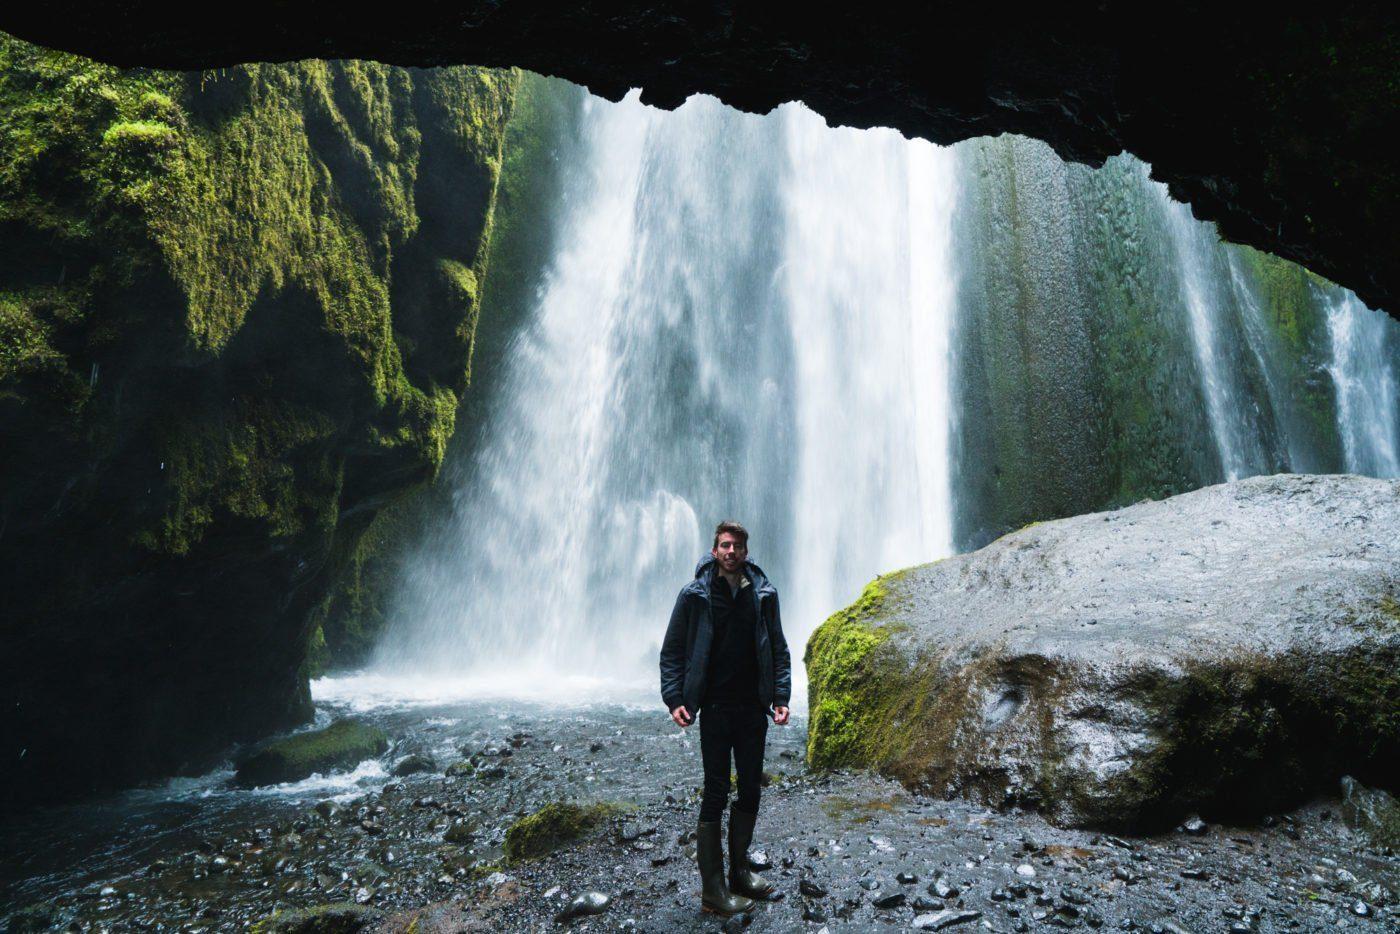 Inside the cave of the Gljufrabui waterfall